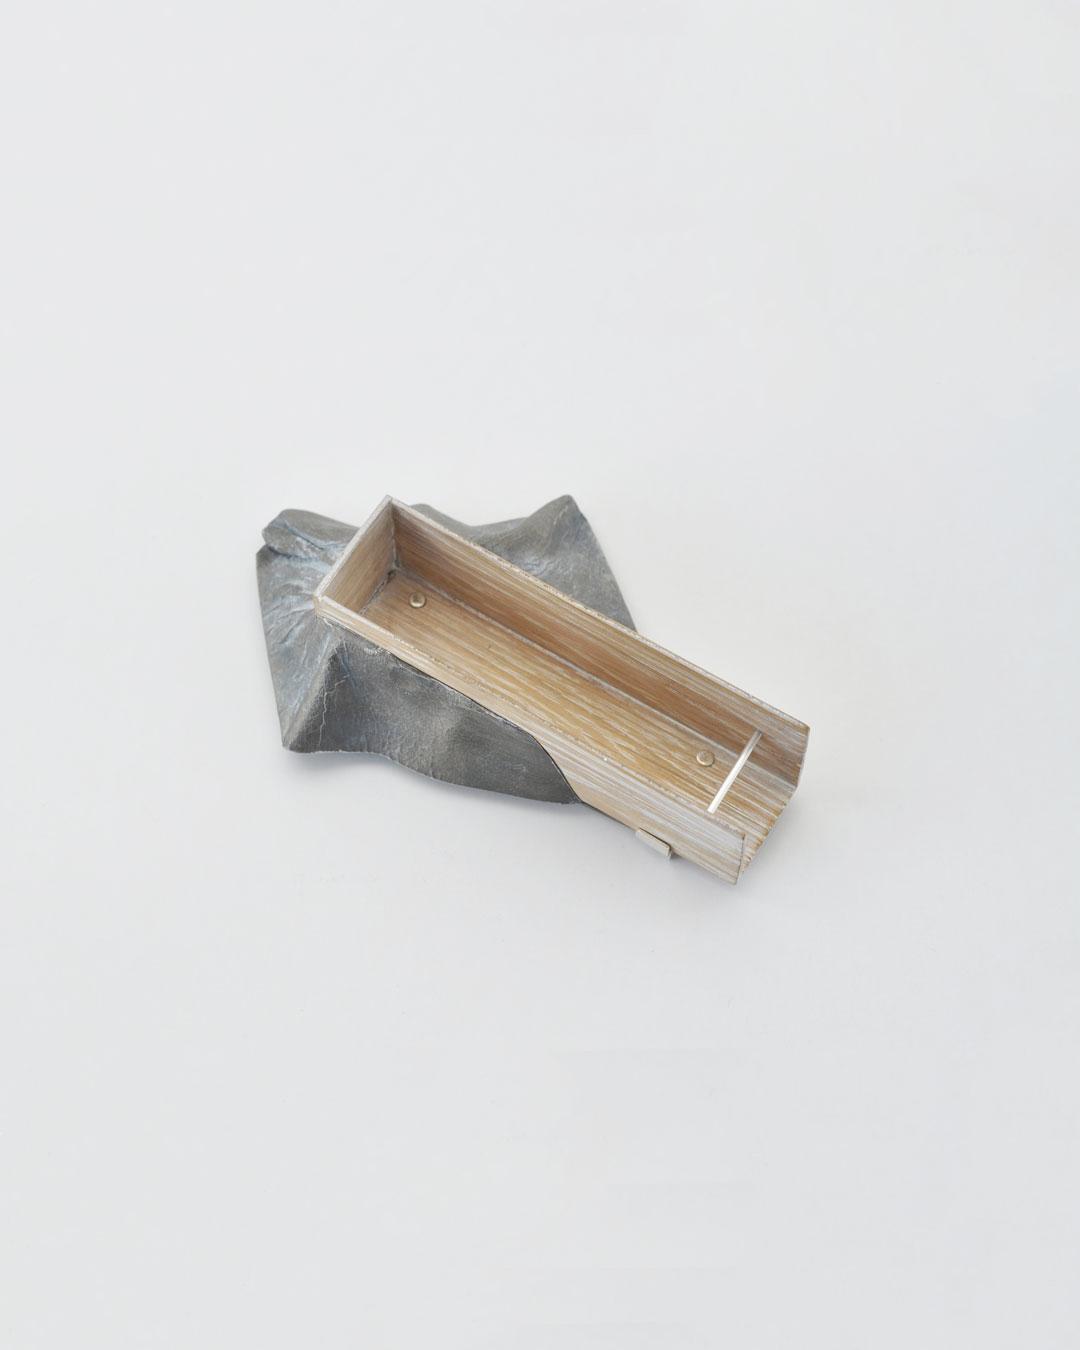 Anders Ljungberg, Declaration #1, 2019, brooch; aluminium, laminated oak, steel, silver, 148 x 95 x 42 mm, €920